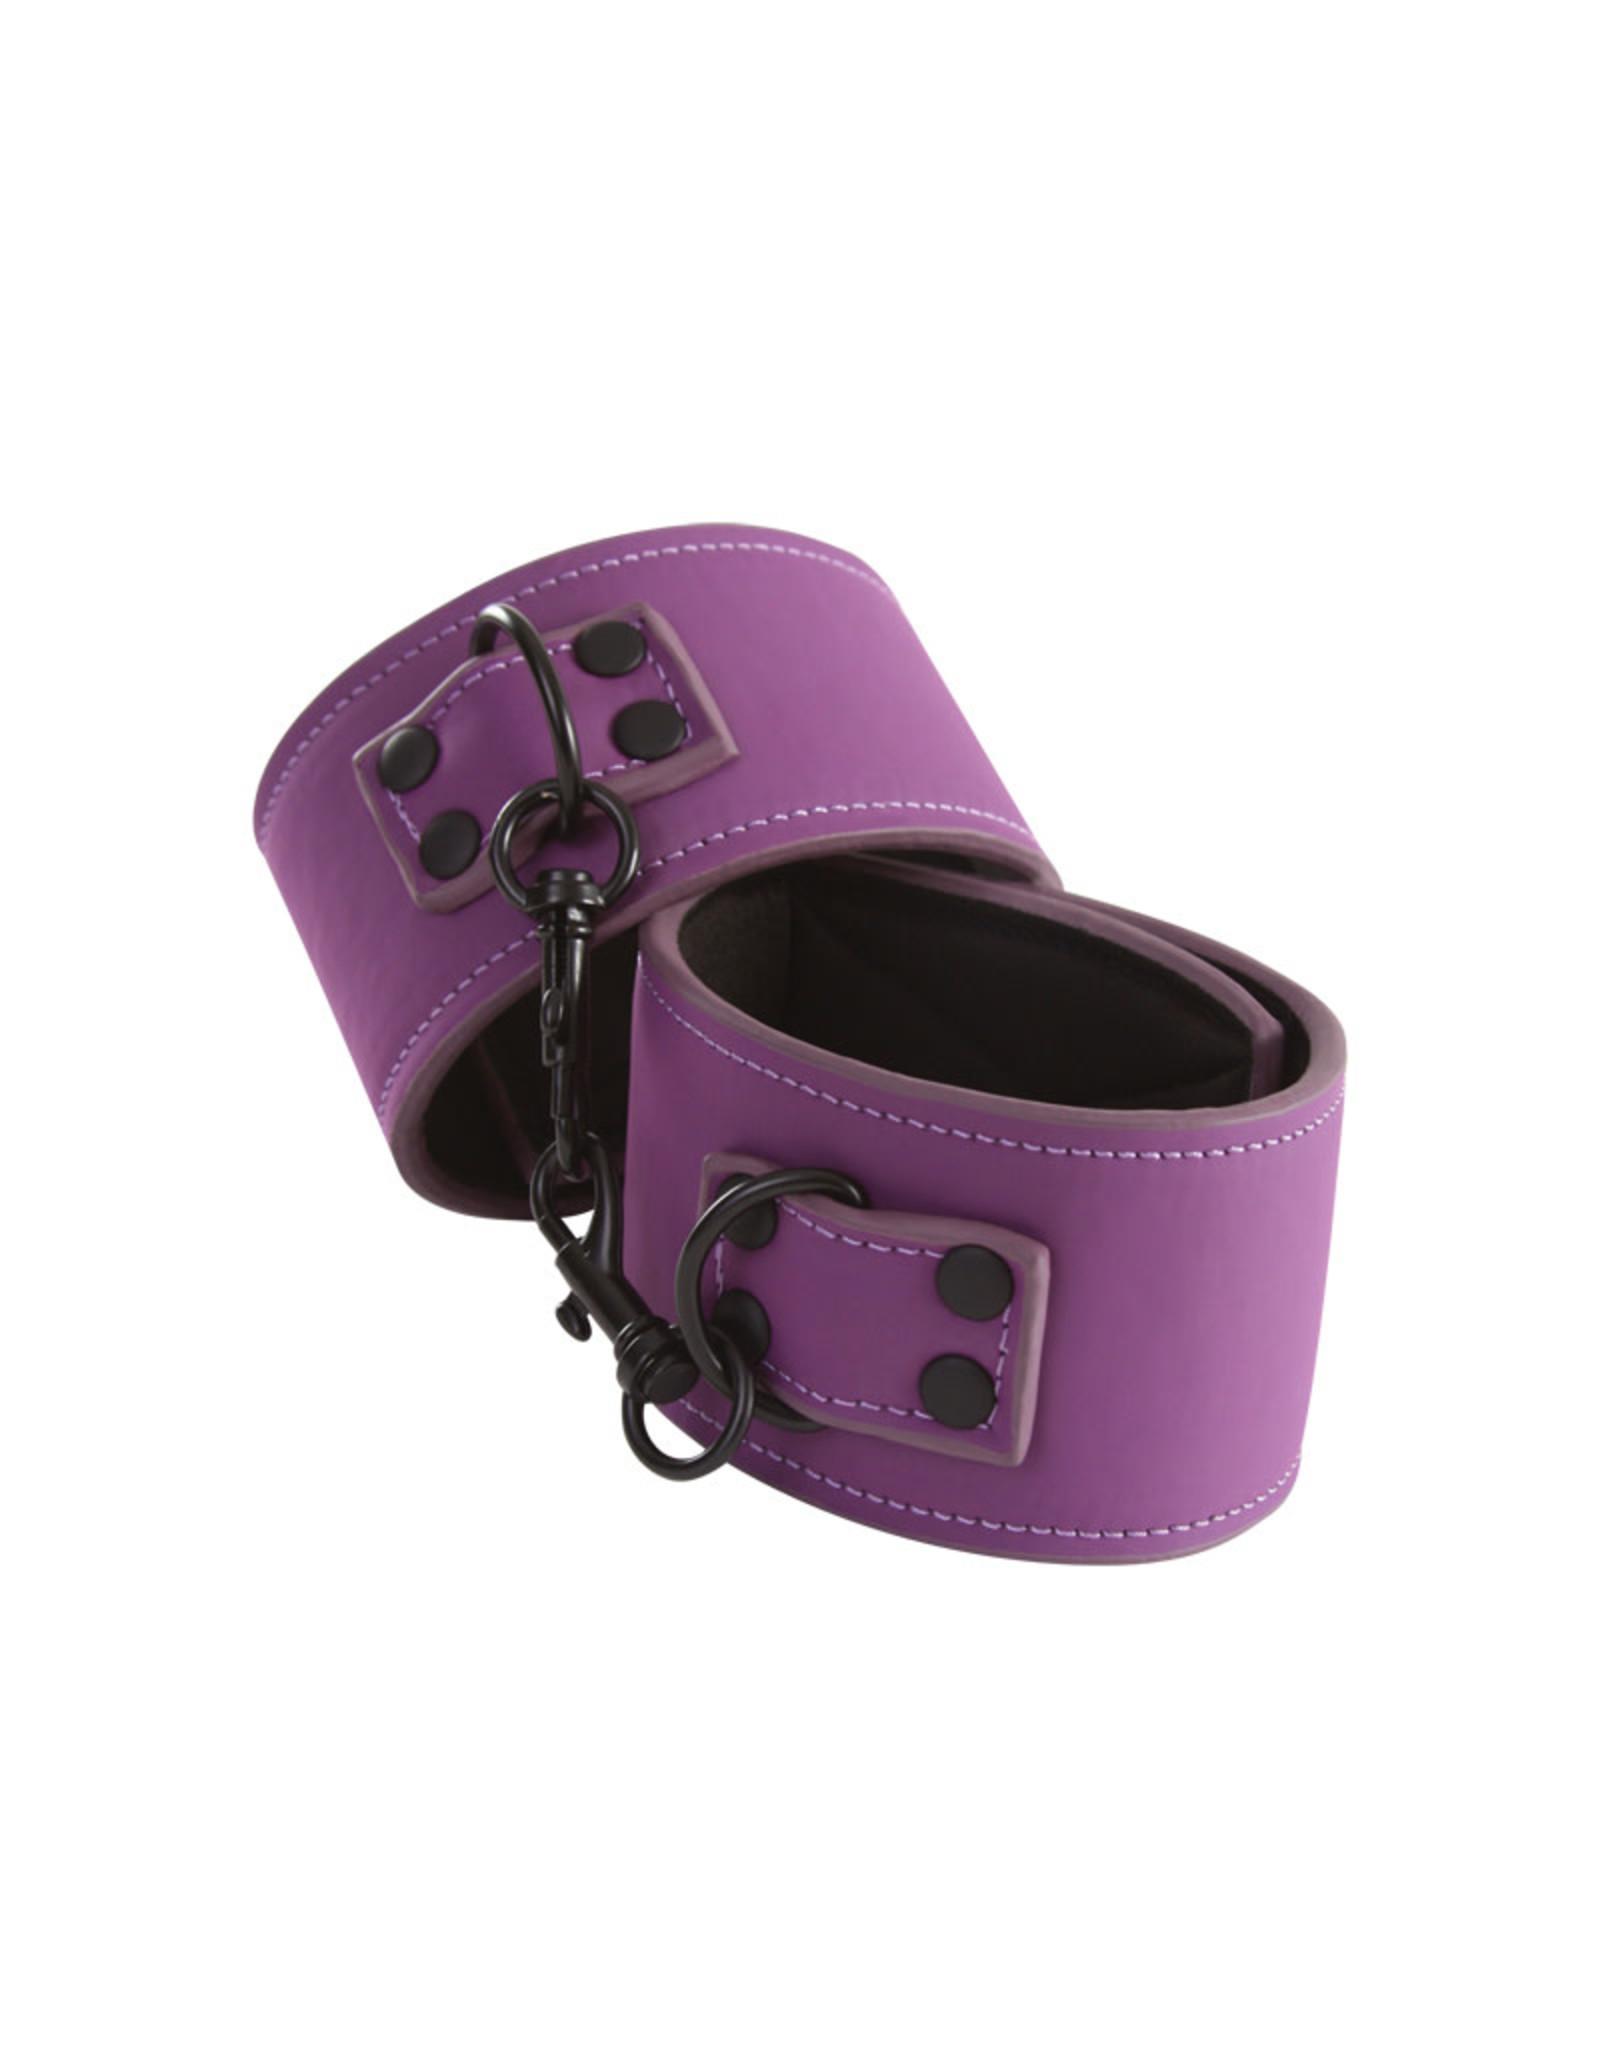 NS Novelties Lust - Bondage Ankle Cuffs - Purple